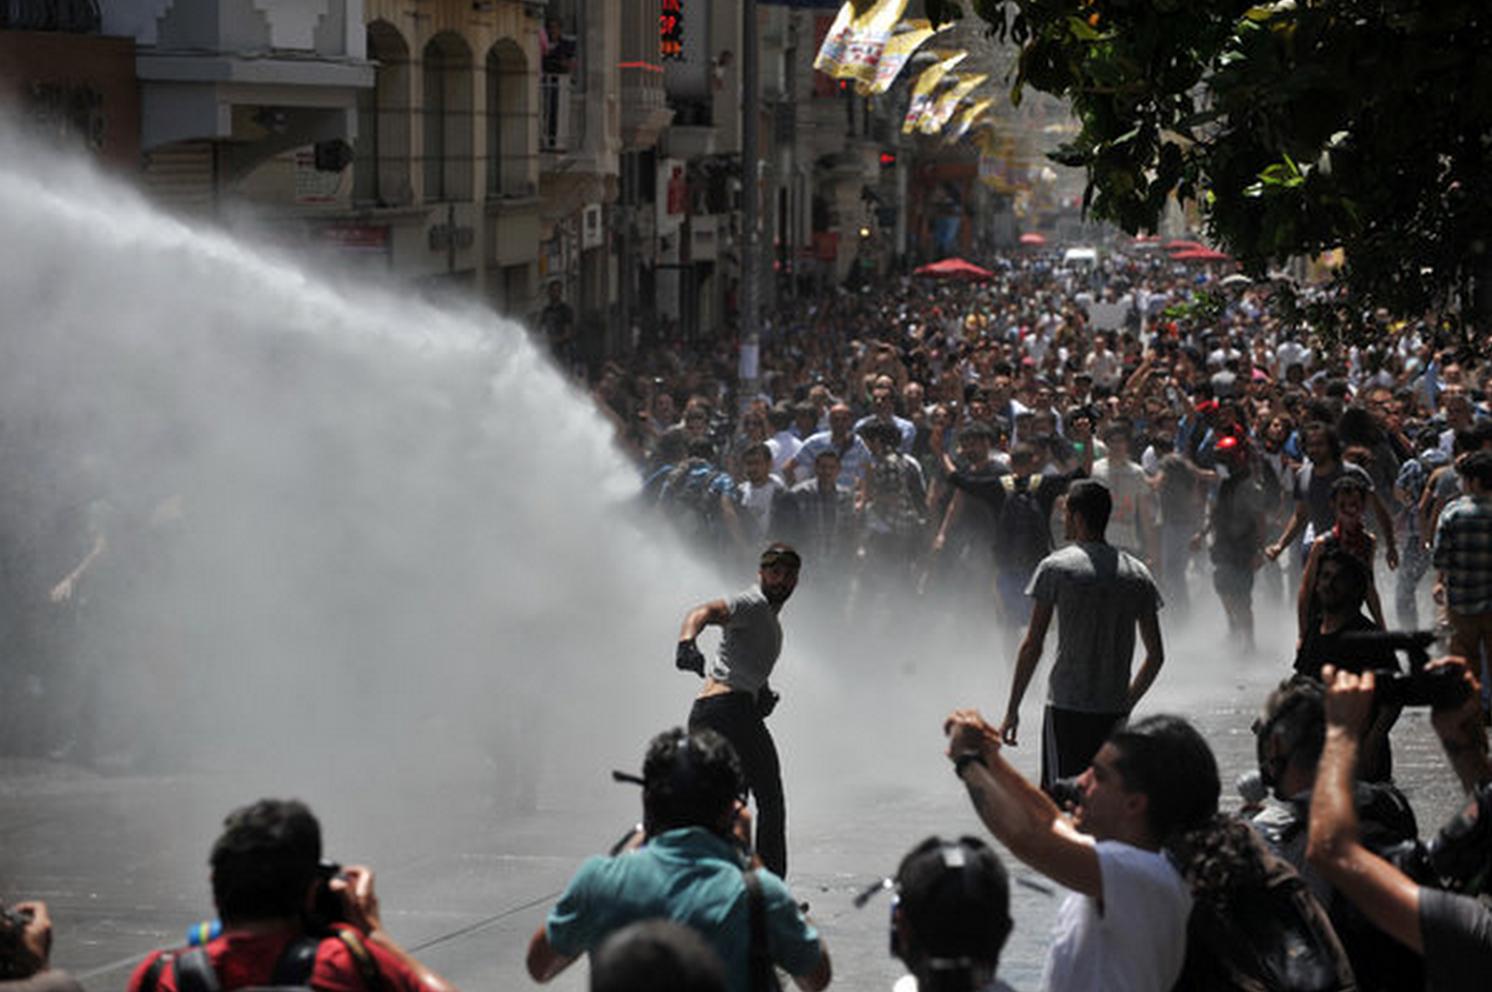 Ozan Kose/Agence France-Presse — Getty Images